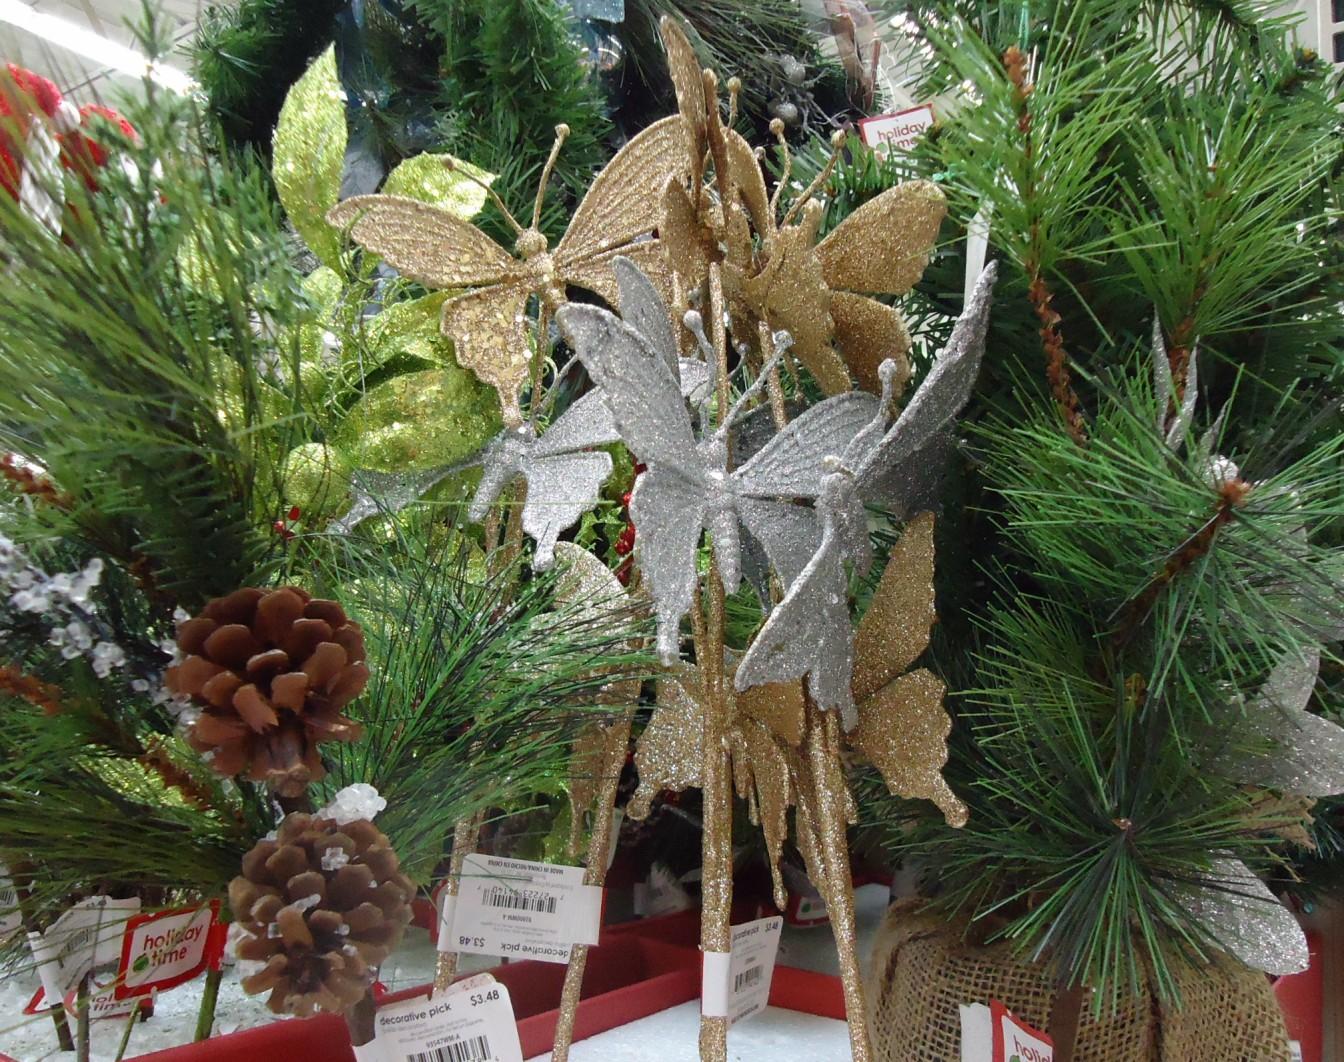 Elegant Christmas Decorations For Sale